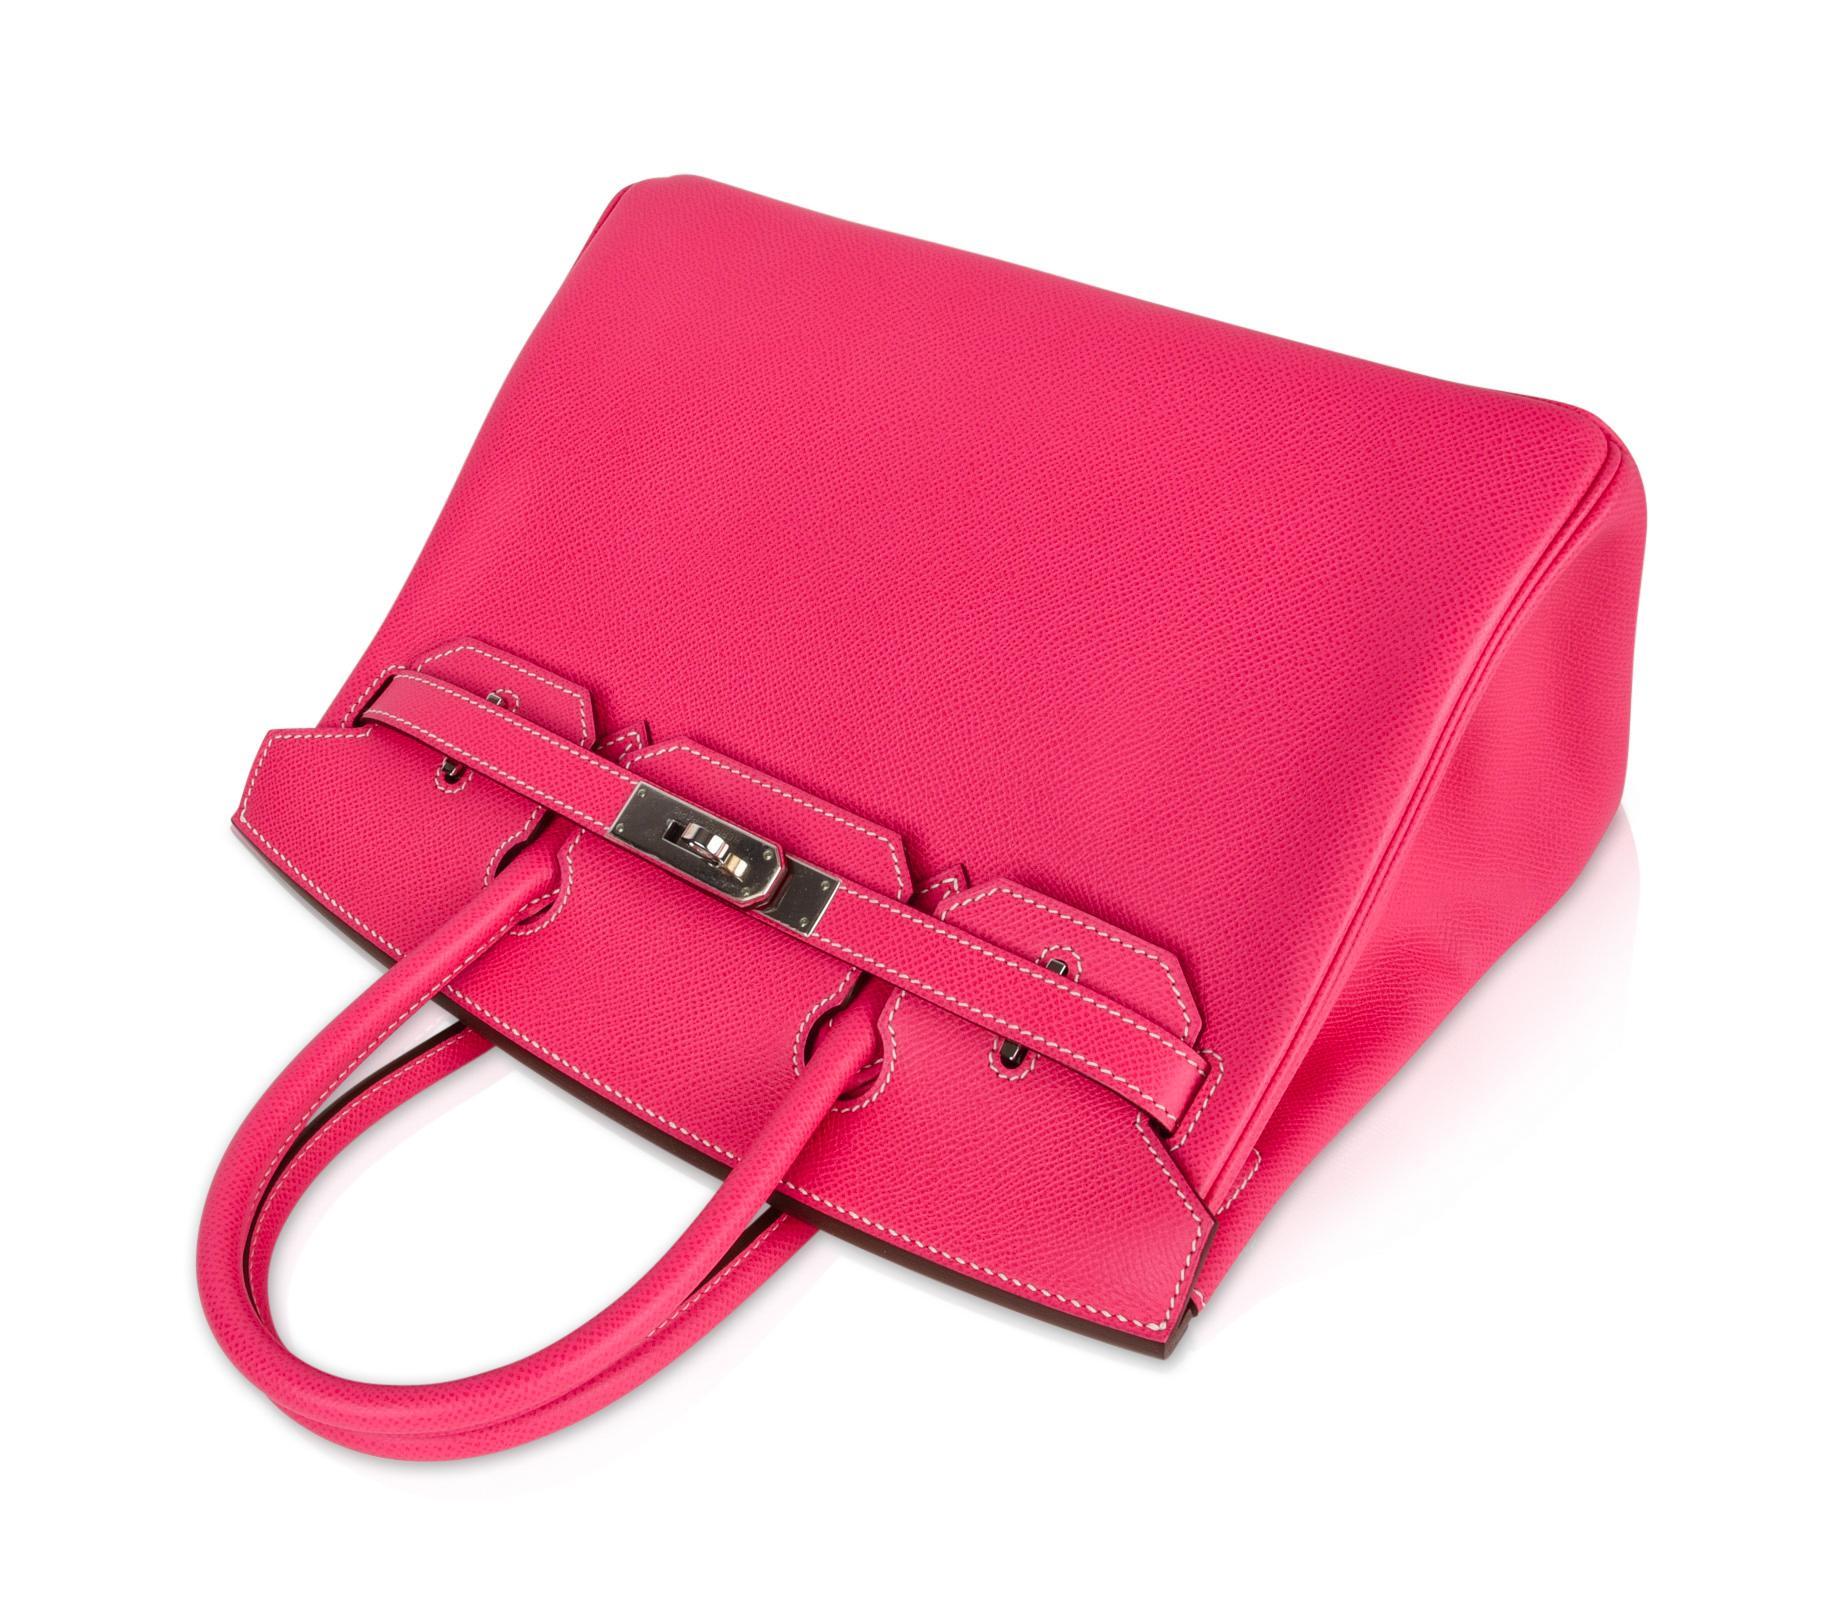 c76b4c2f9ec Hermes Birkin 30 Bag Limited Edition Rose Tyrien Candy Epsom Palladium For  Sale at 1stdibs